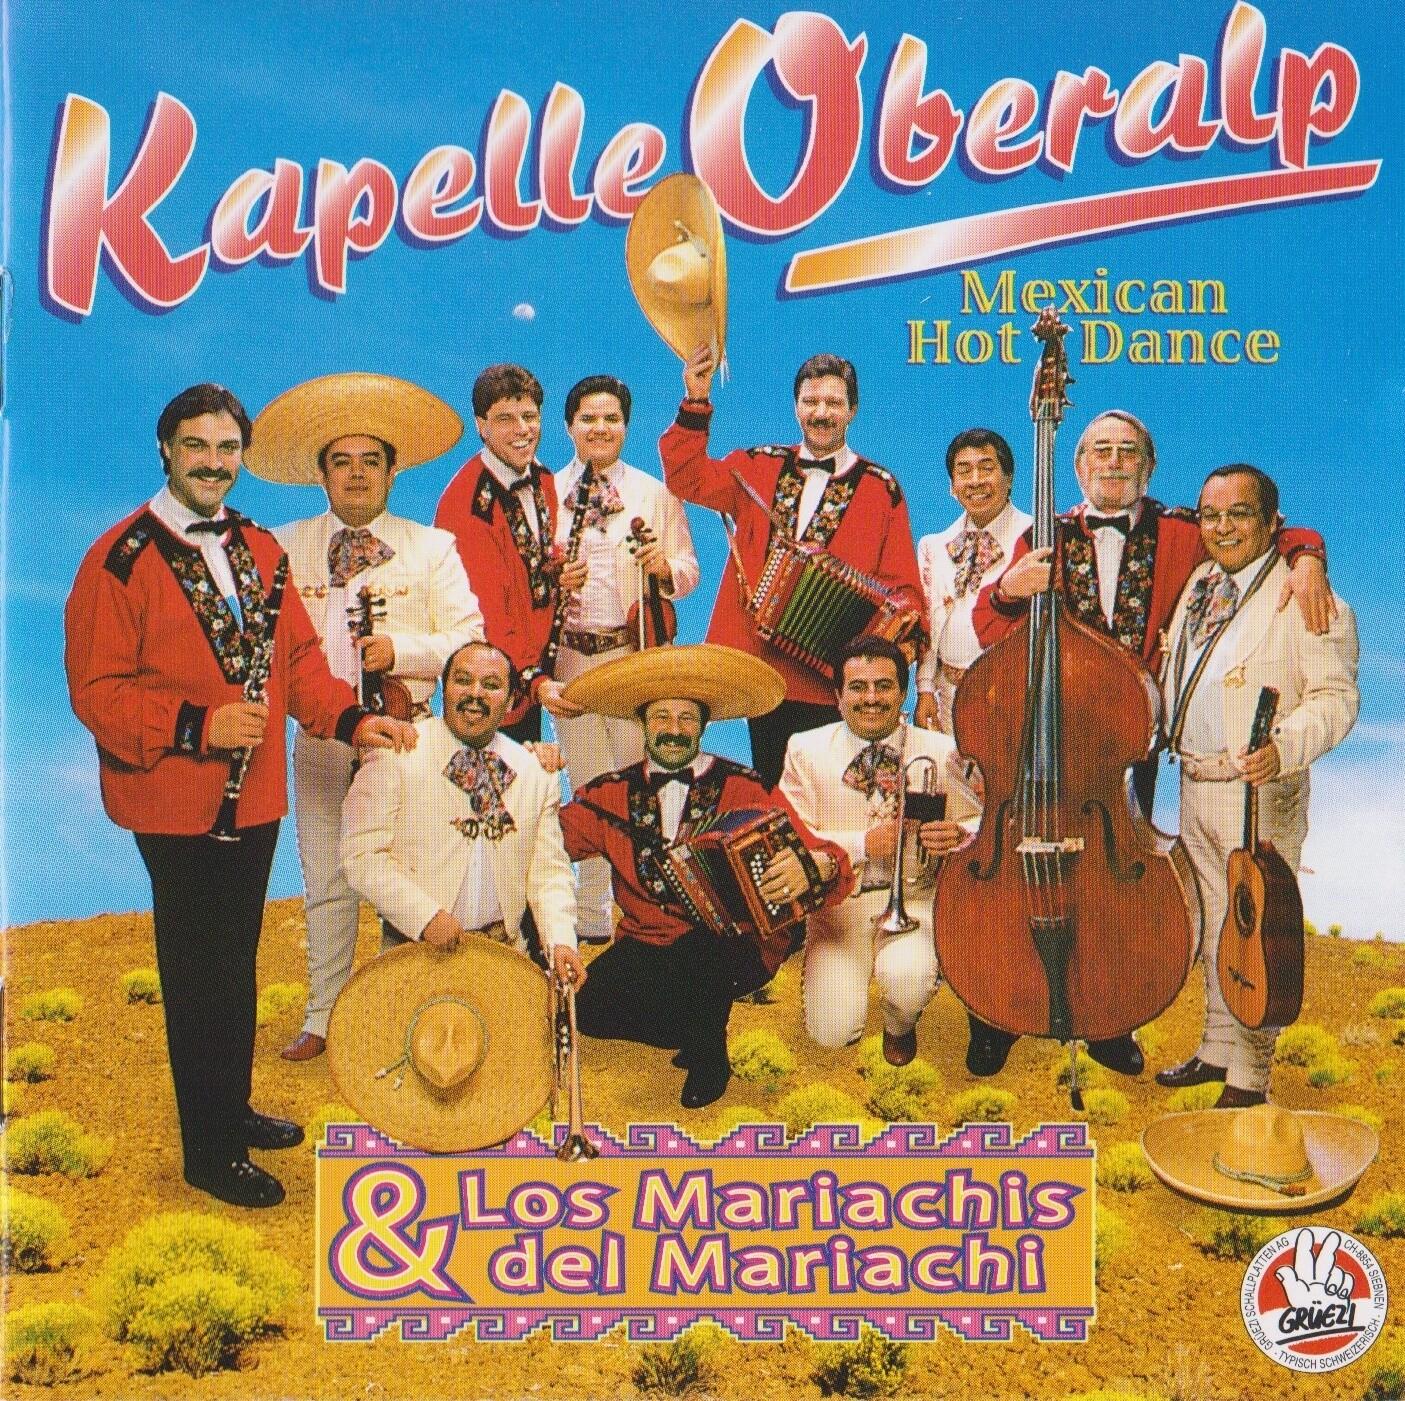 Kapelle Oberalp & Los Mariachis del Mariachi